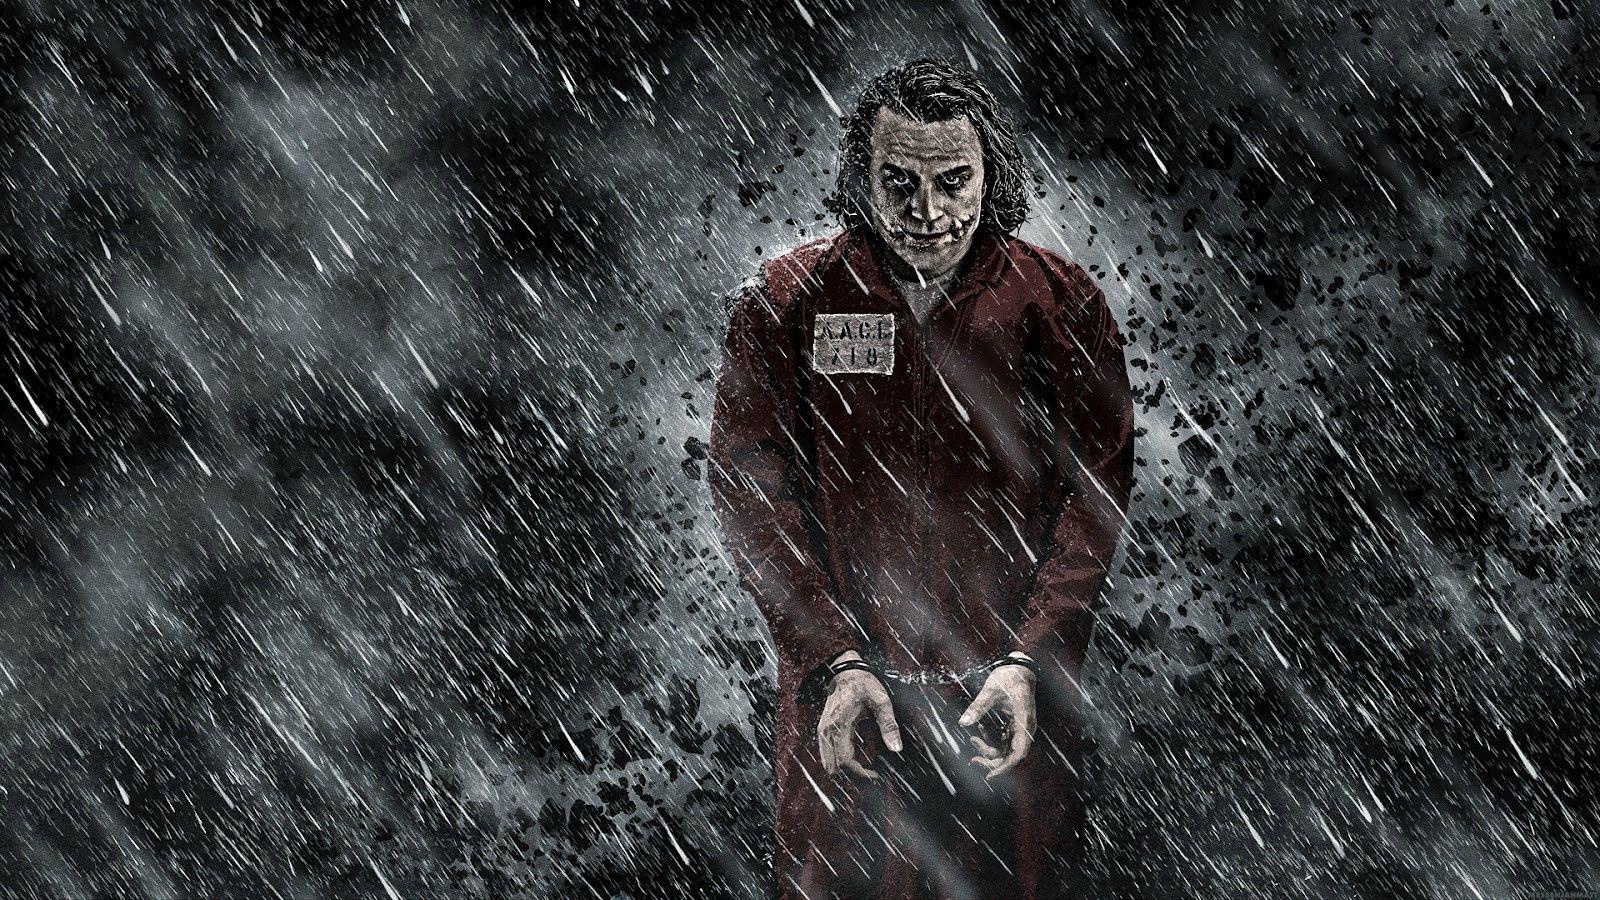 The Joker Wallpaper By LHNinjaChicken On DeviantArt 1920x1080 The